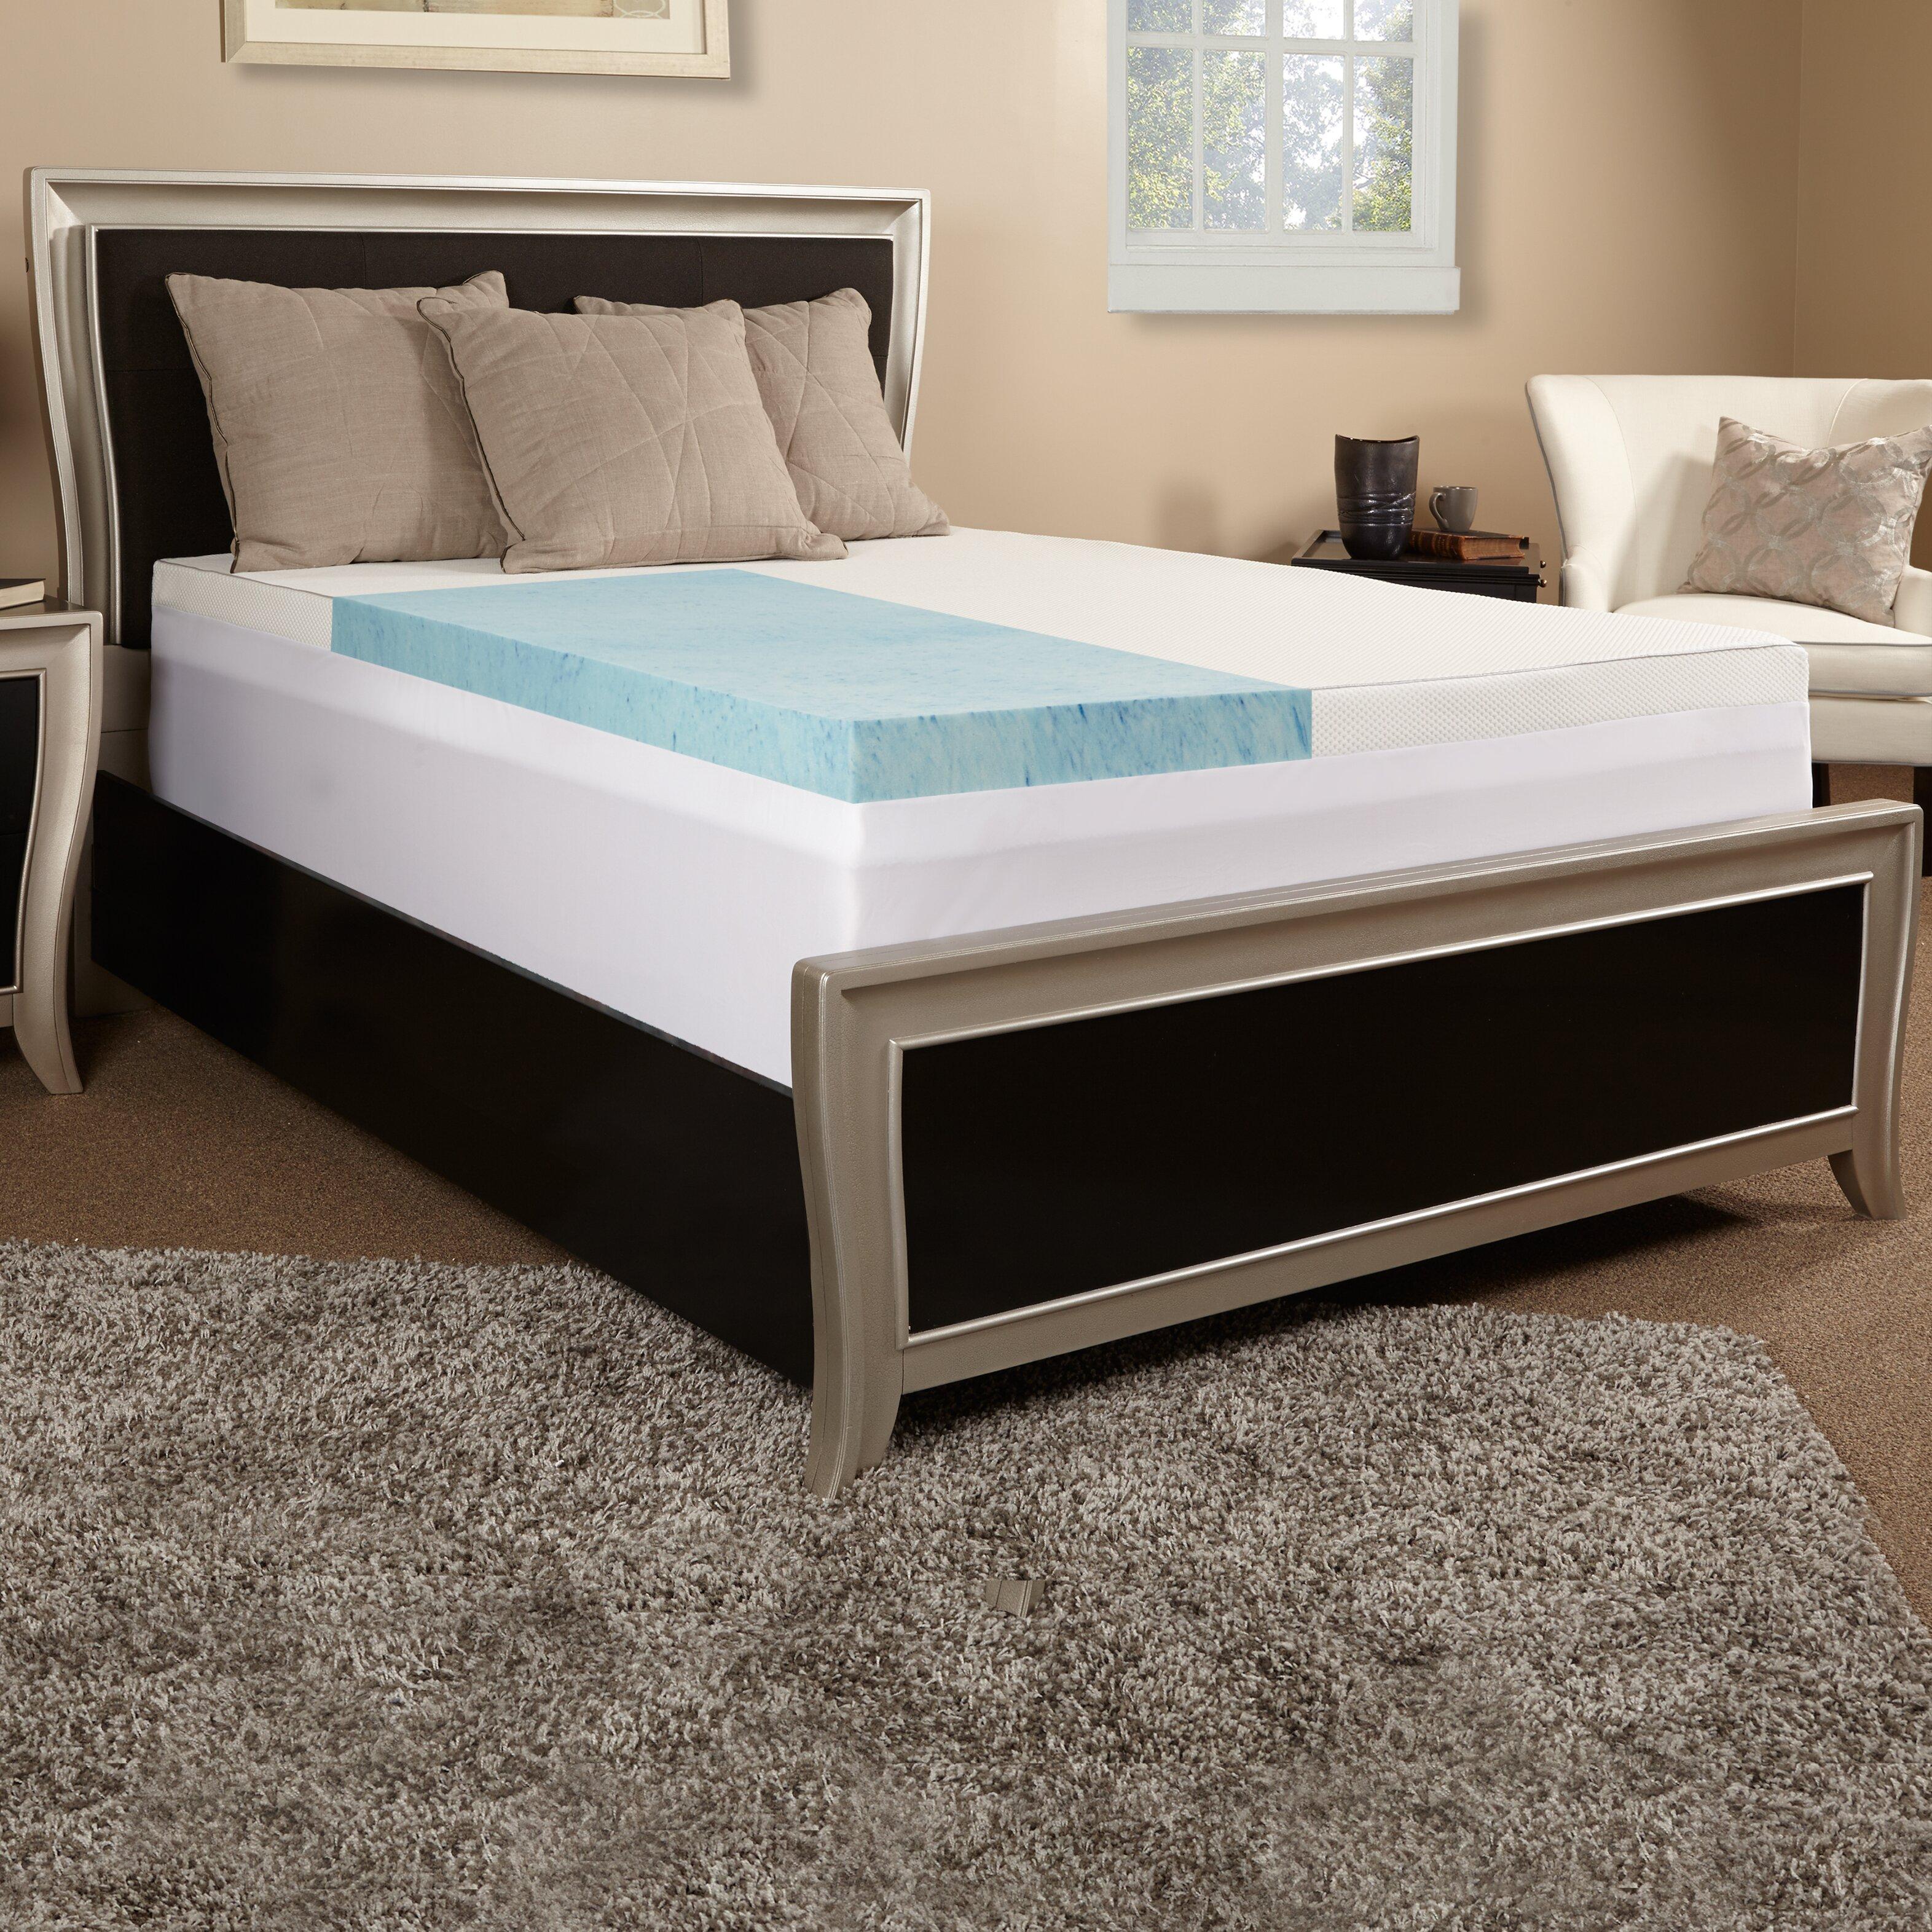 luxury solutions 4 gel memory foam mattress topper w cover reviews wayfair. Black Bedroom Furniture Sets. Home Design Ideas